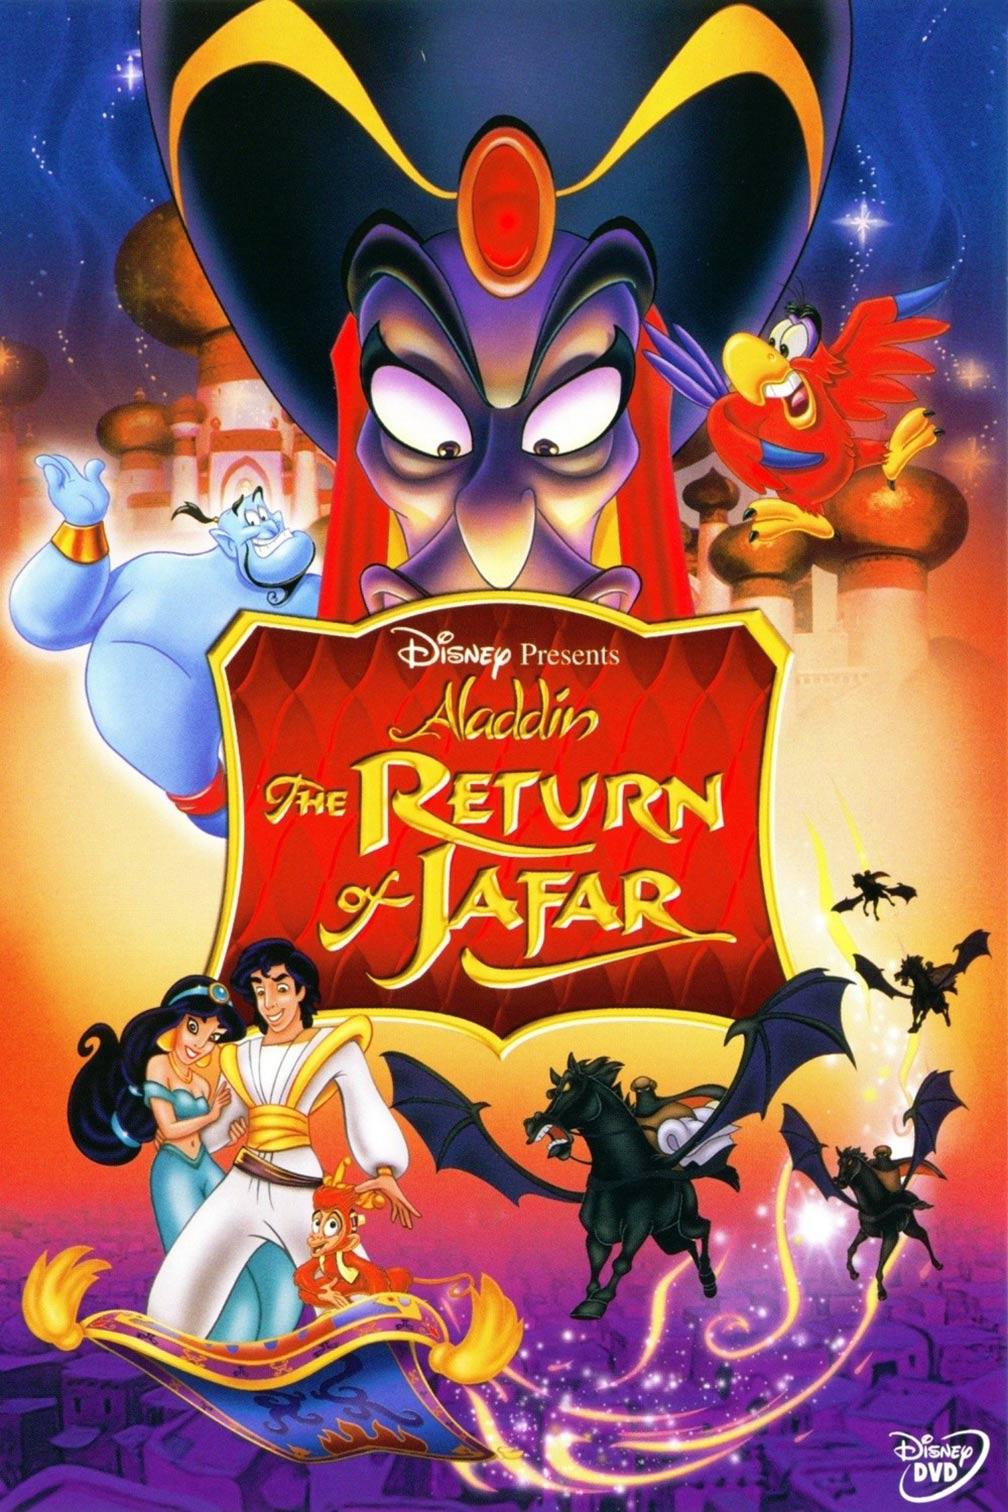 Aladdin 2: The Return of Jafar Poster #1